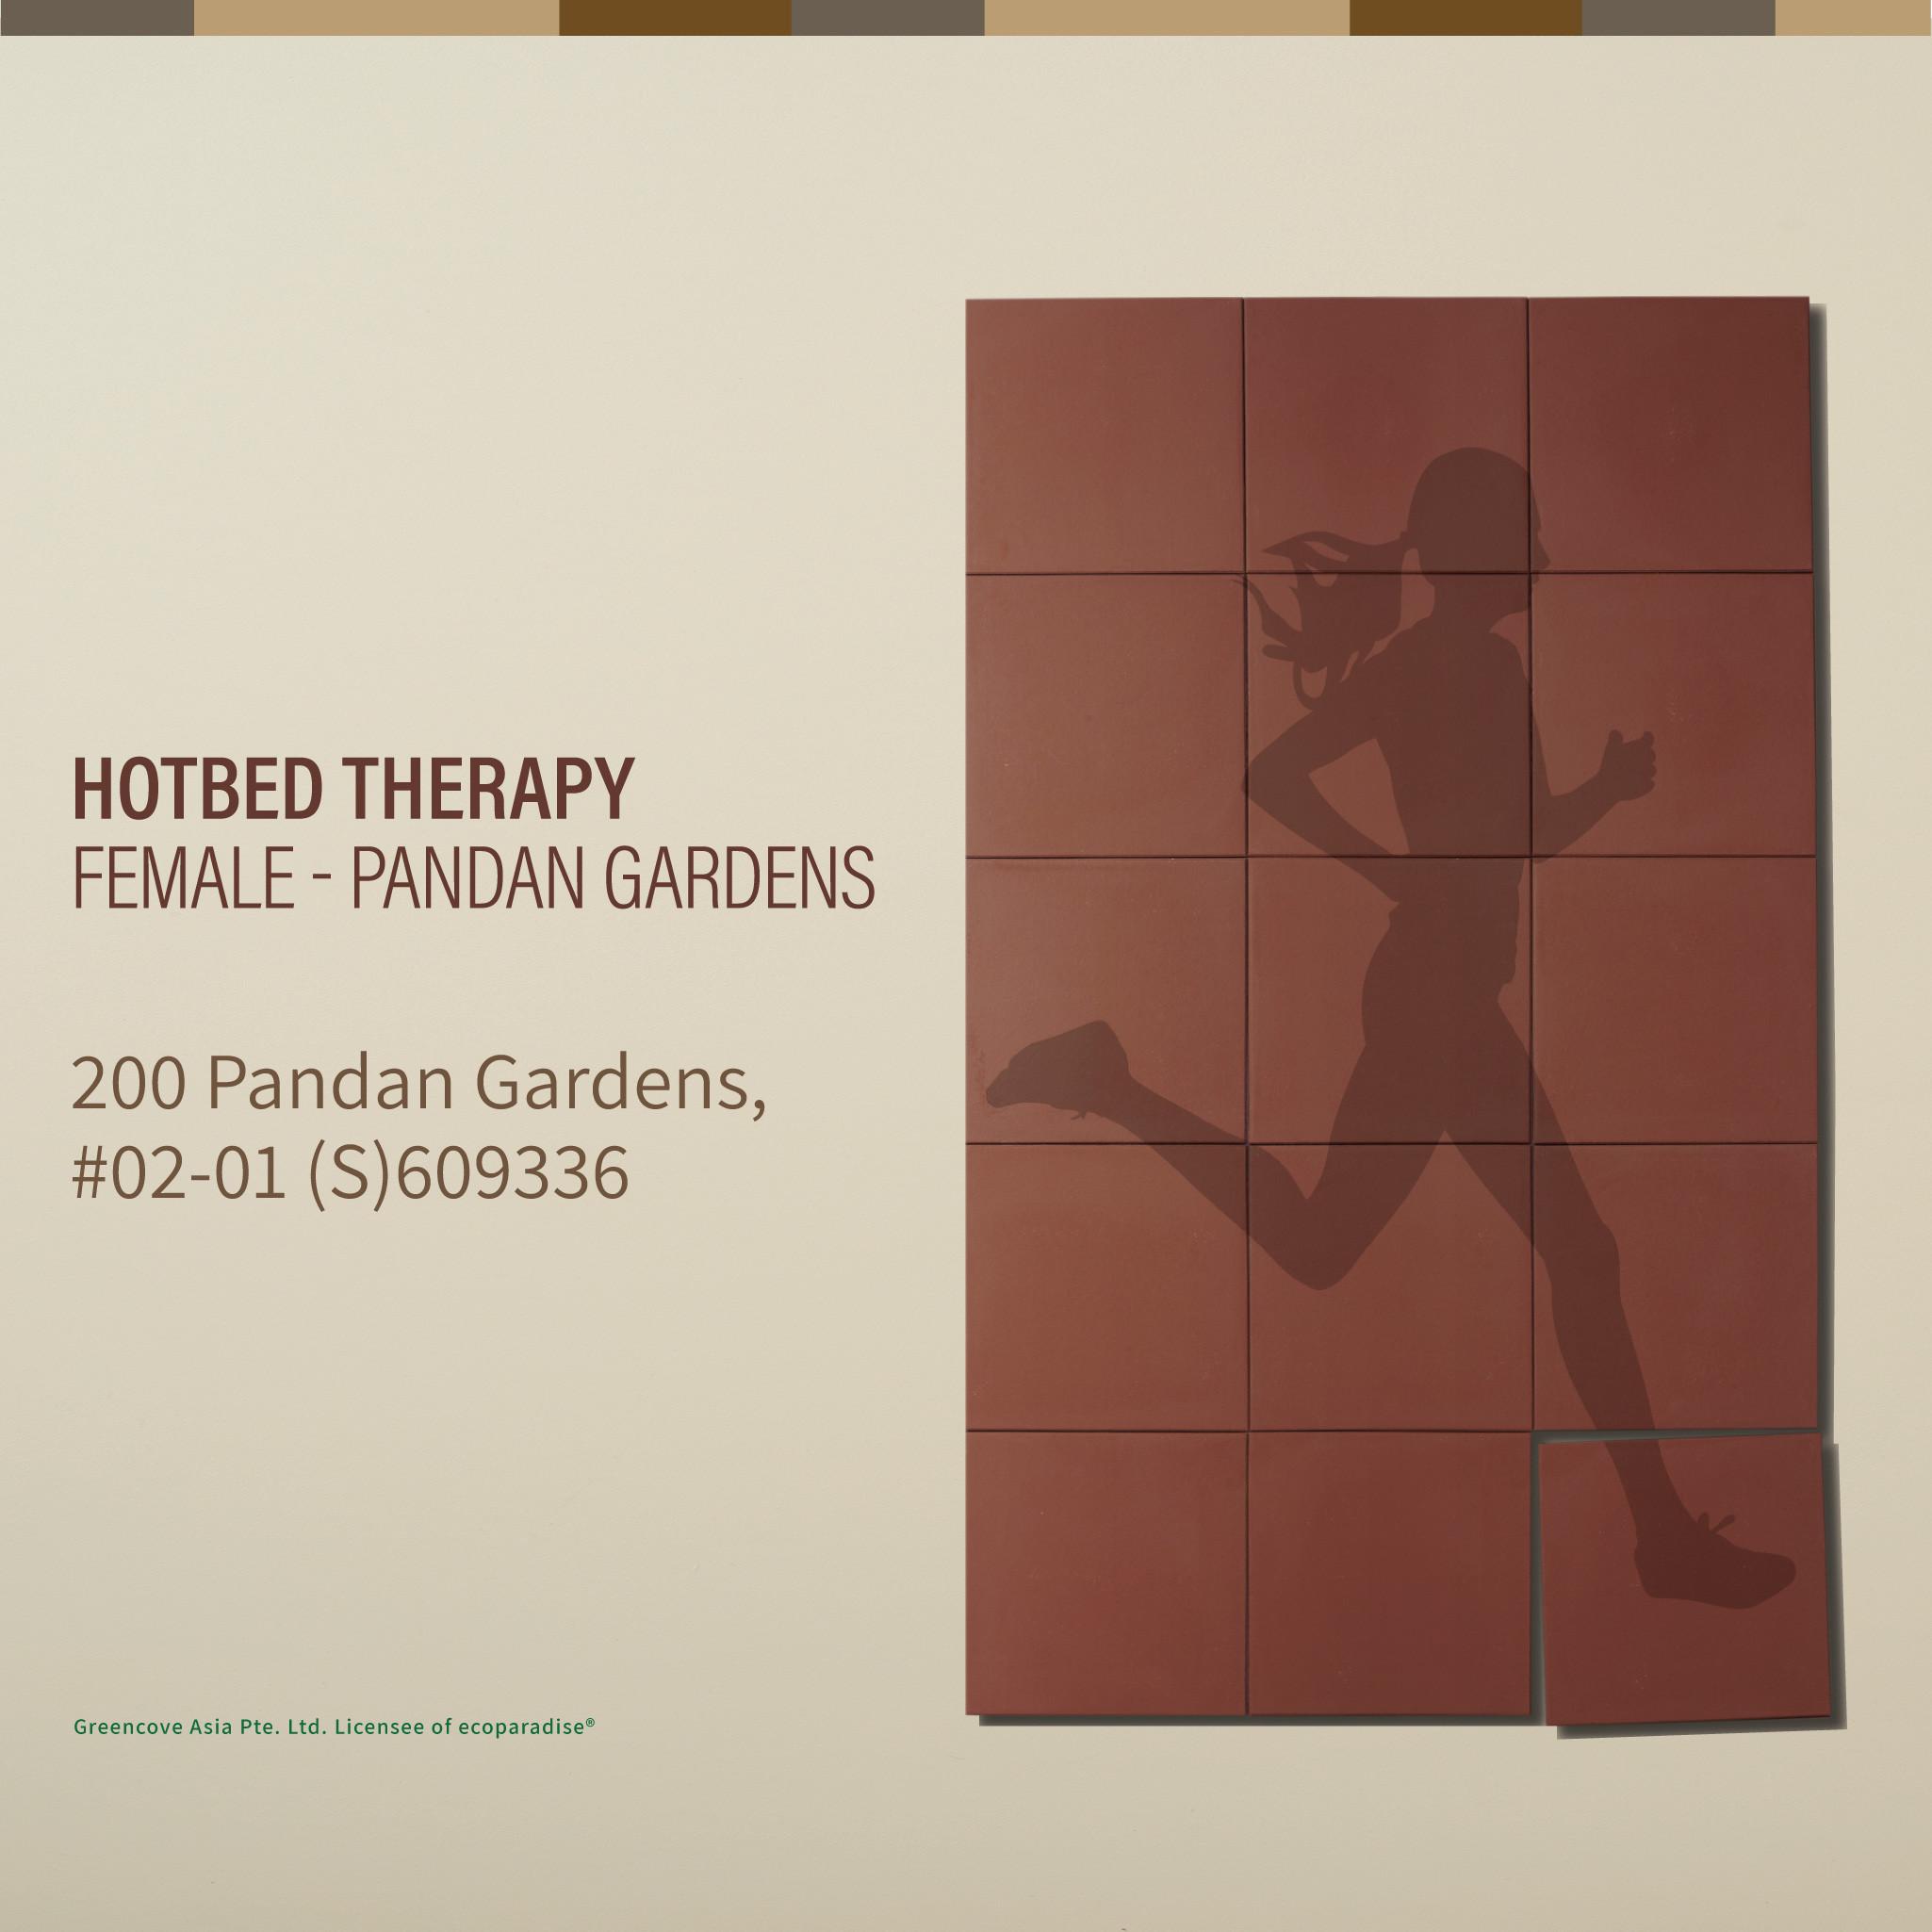 Hotbed - Pandan Gardens (Female)